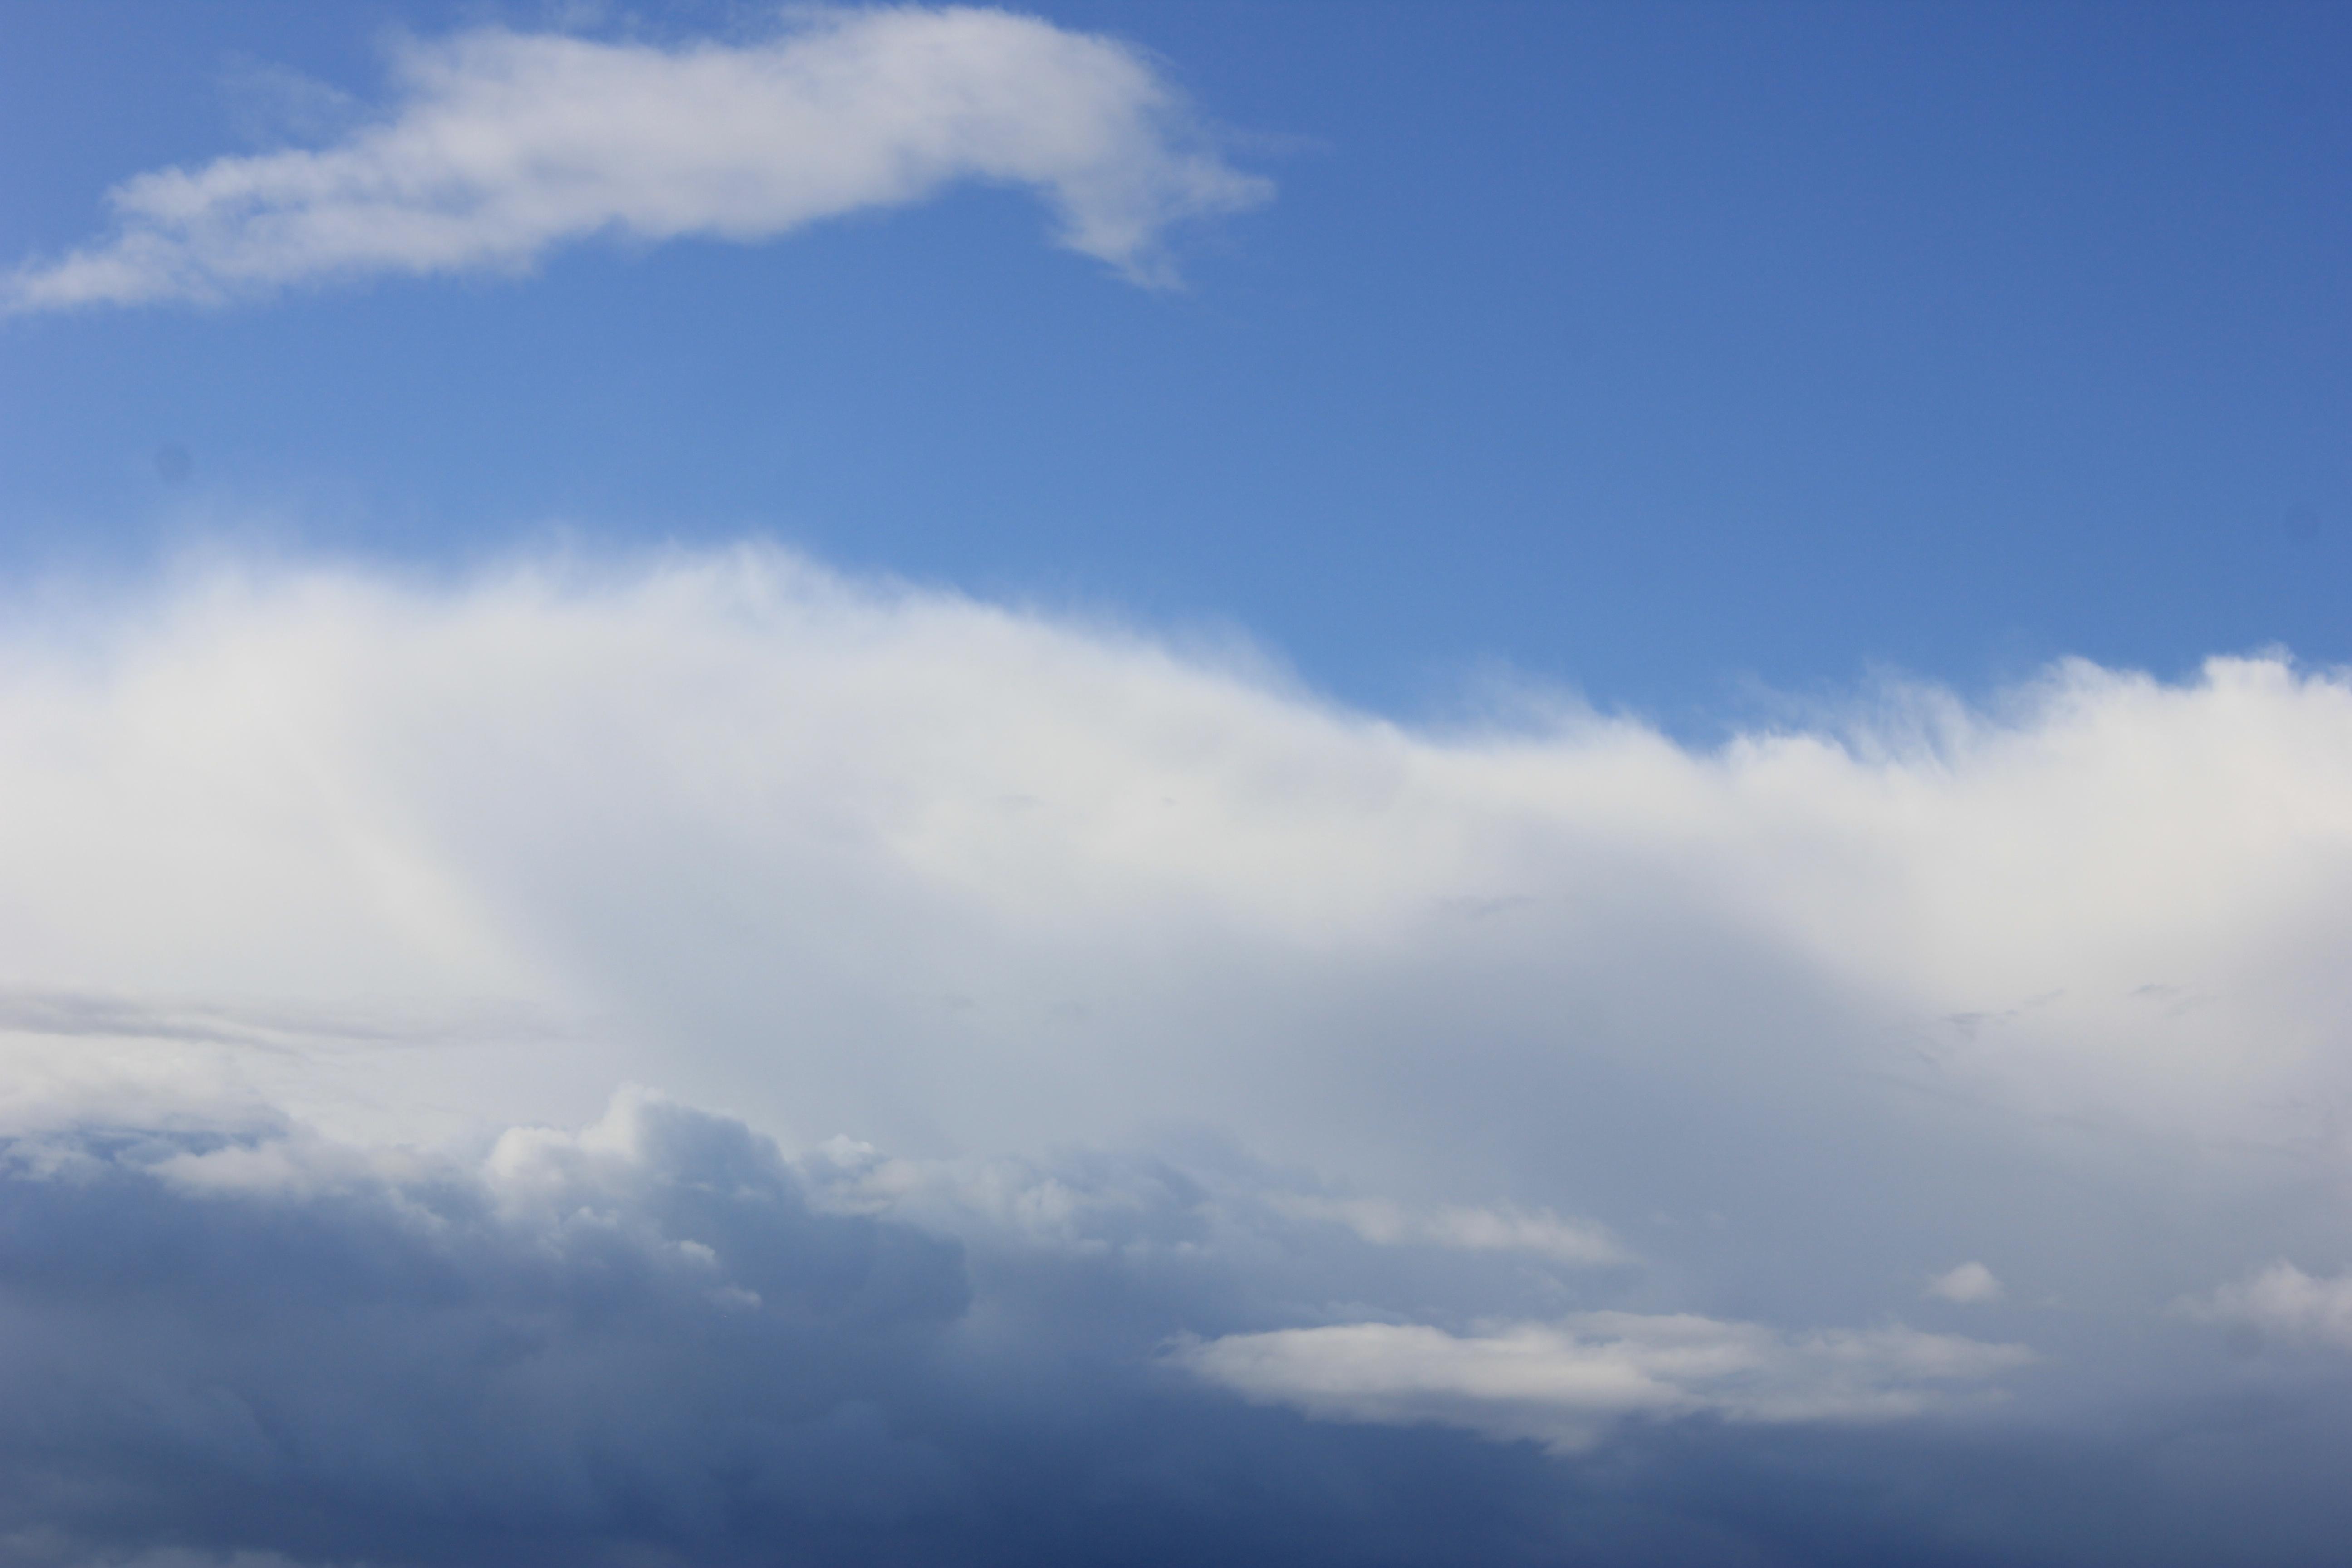 прелести небо сентября (11)